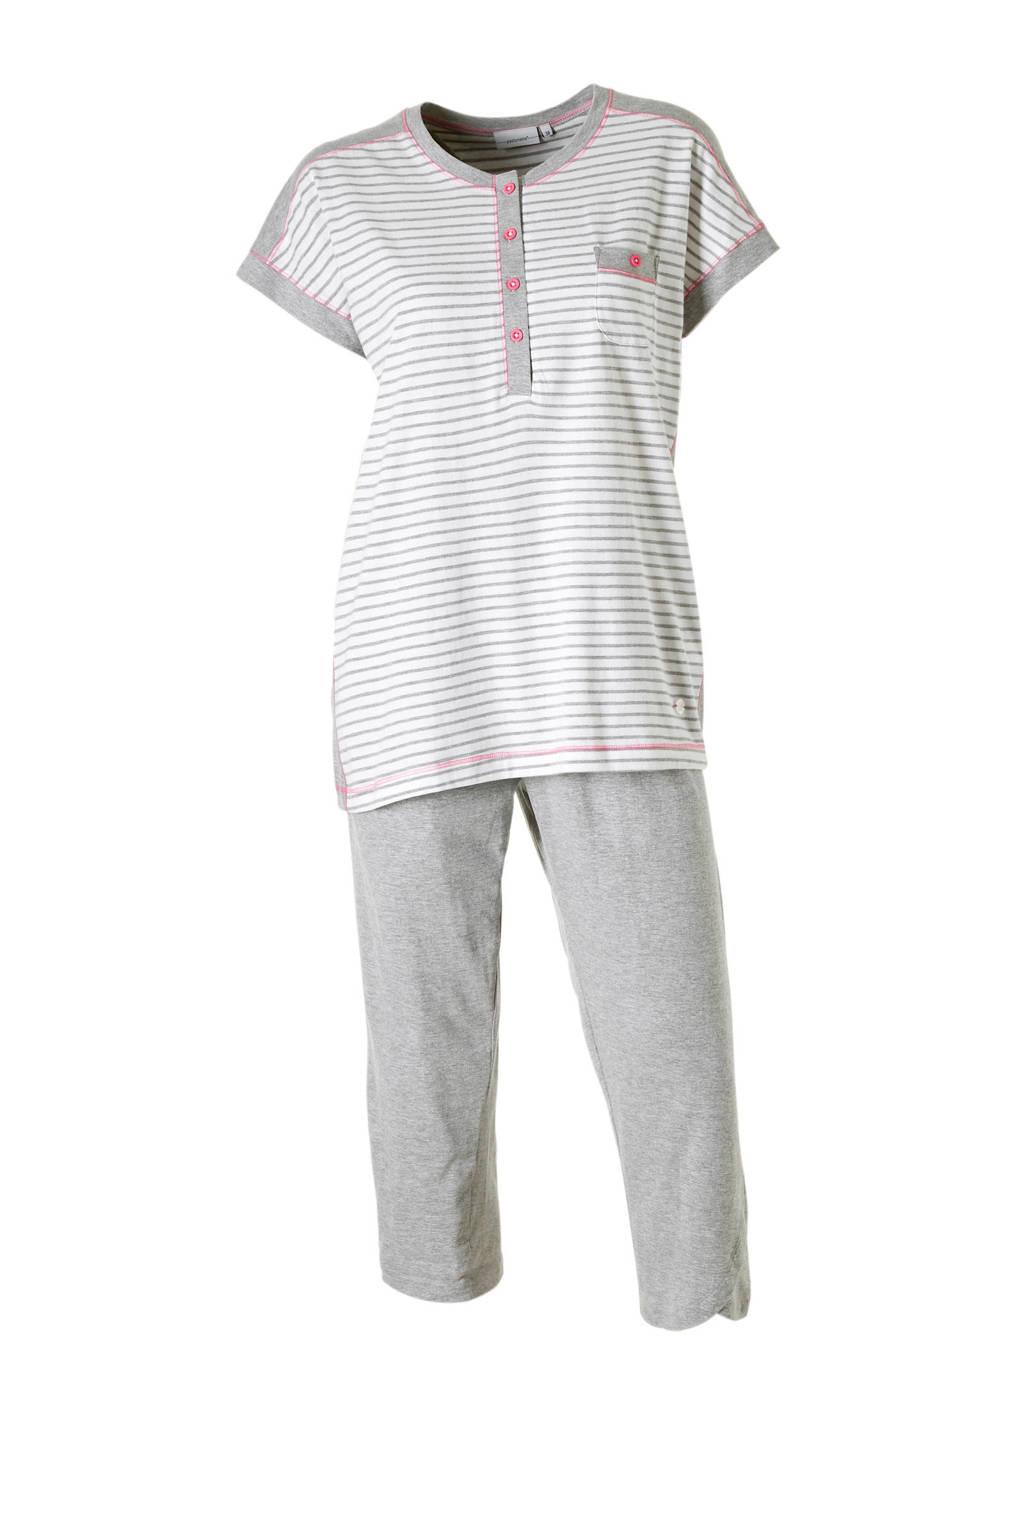 Pastunette pyjama streep grijs/wit, Grijs/wit